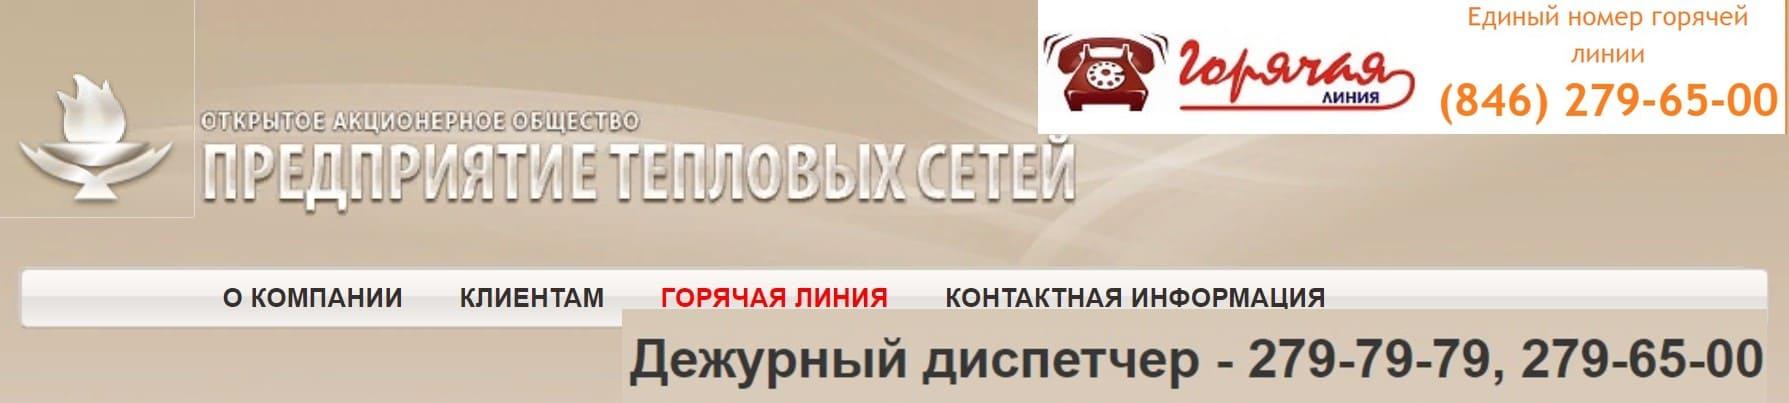 ПТС Самара сайт